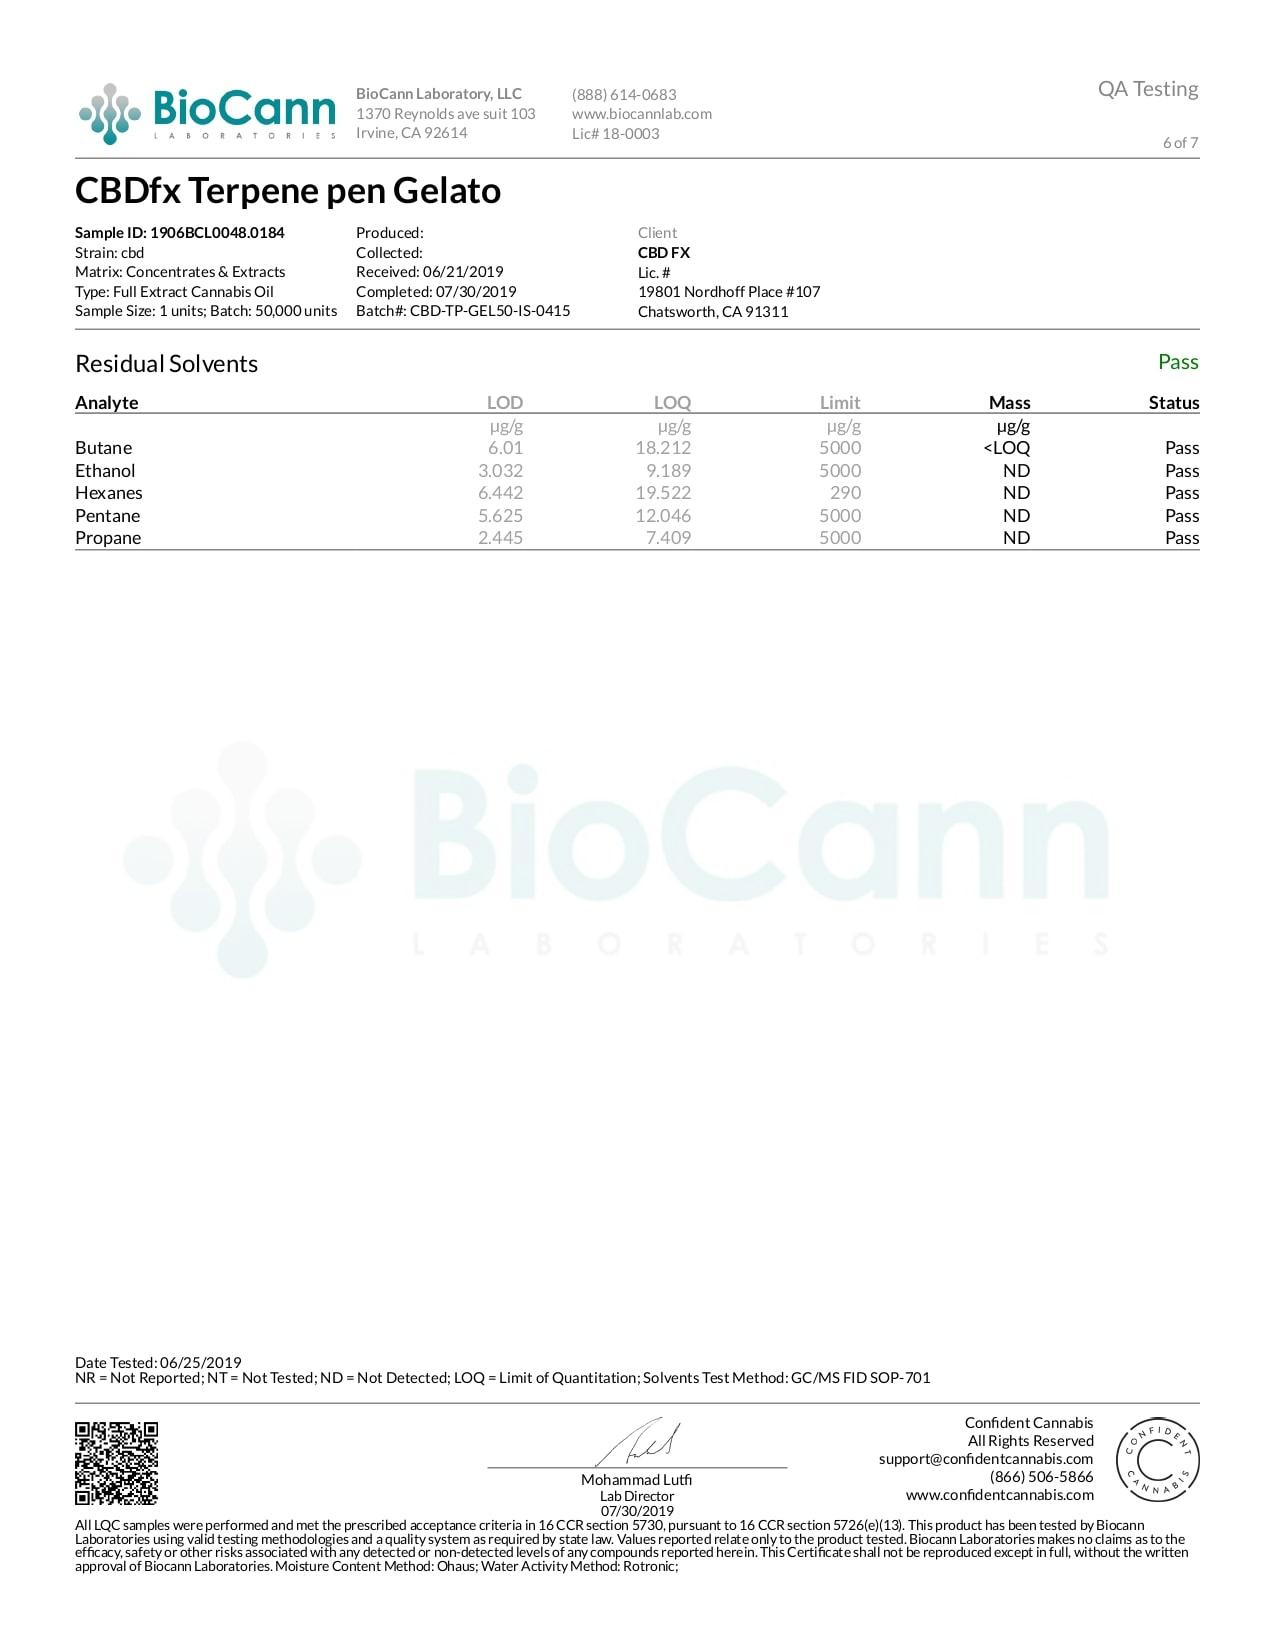 CBDfx Gelato Lab Report CBD Terpenes Vape Pen 50mg